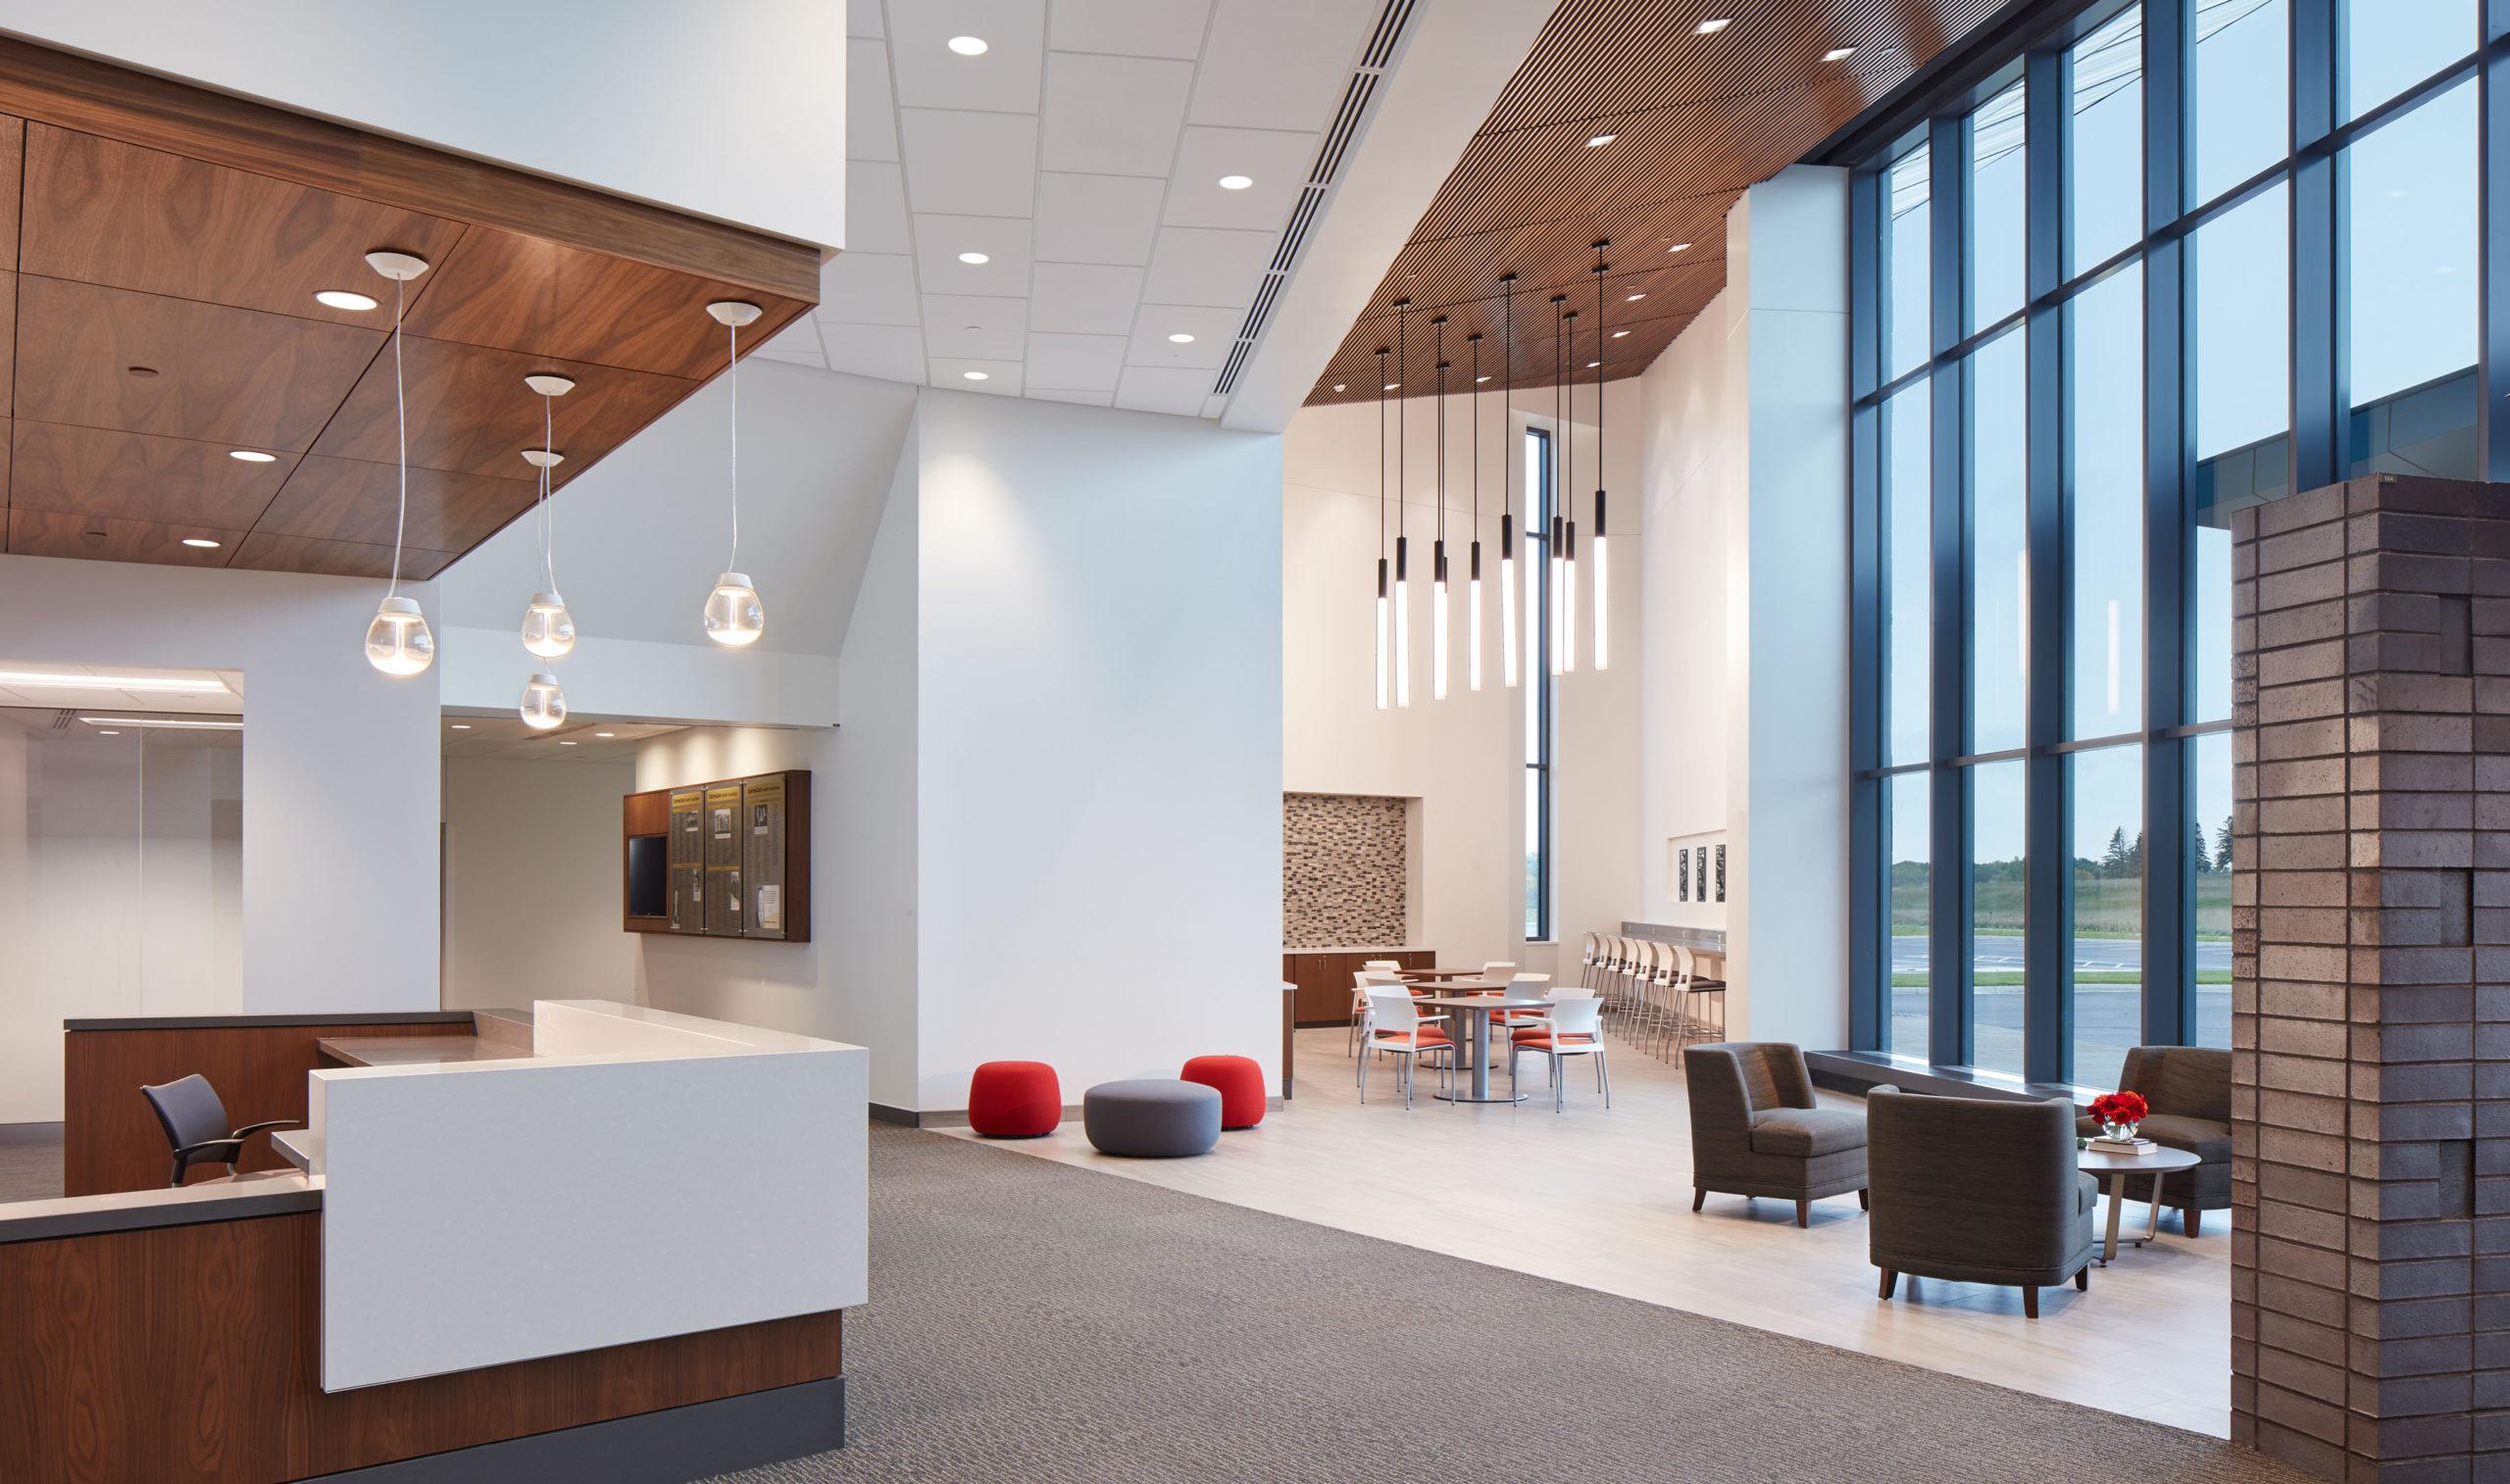 CentraCare-LongPrairieMN-SoundPly-Alta-Acoustic-Ceiling-Panels-healthcare solutions